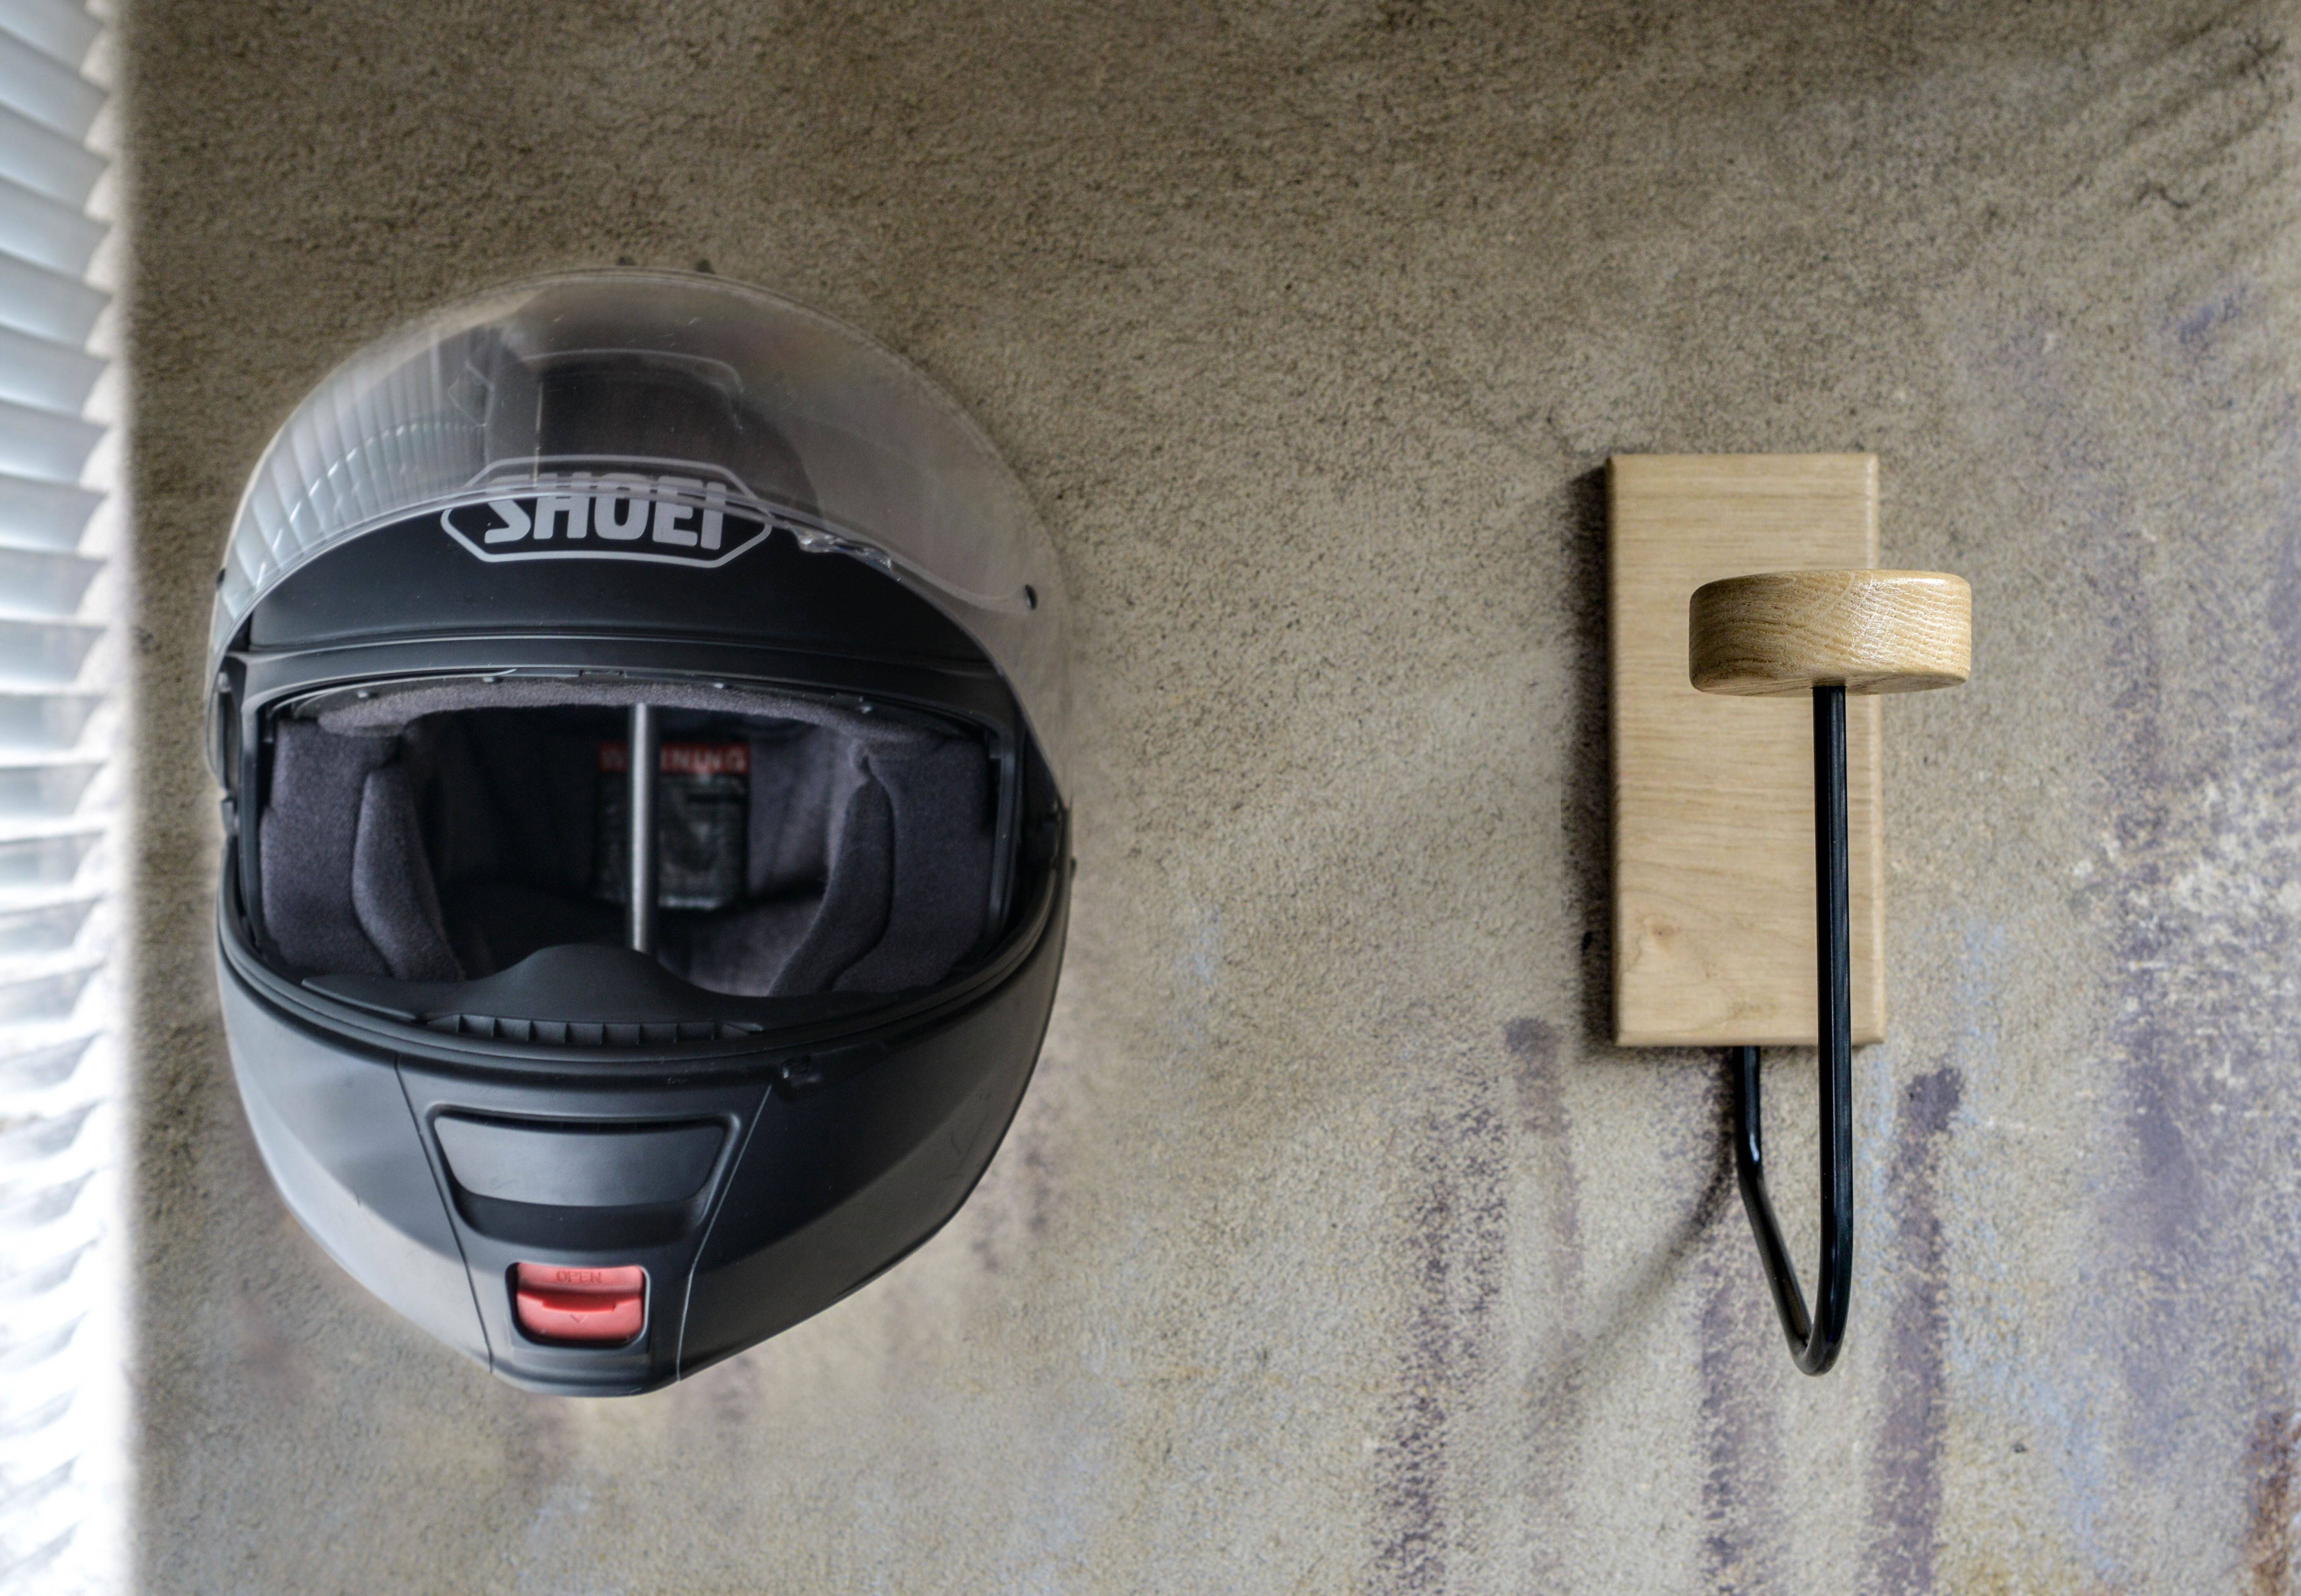 Porte Casque Helmet Rack France Waynscot Motorcycle Helmet Accessoires Decor Interieur Handmade Biker Porte Casque Casque Casque Helmet